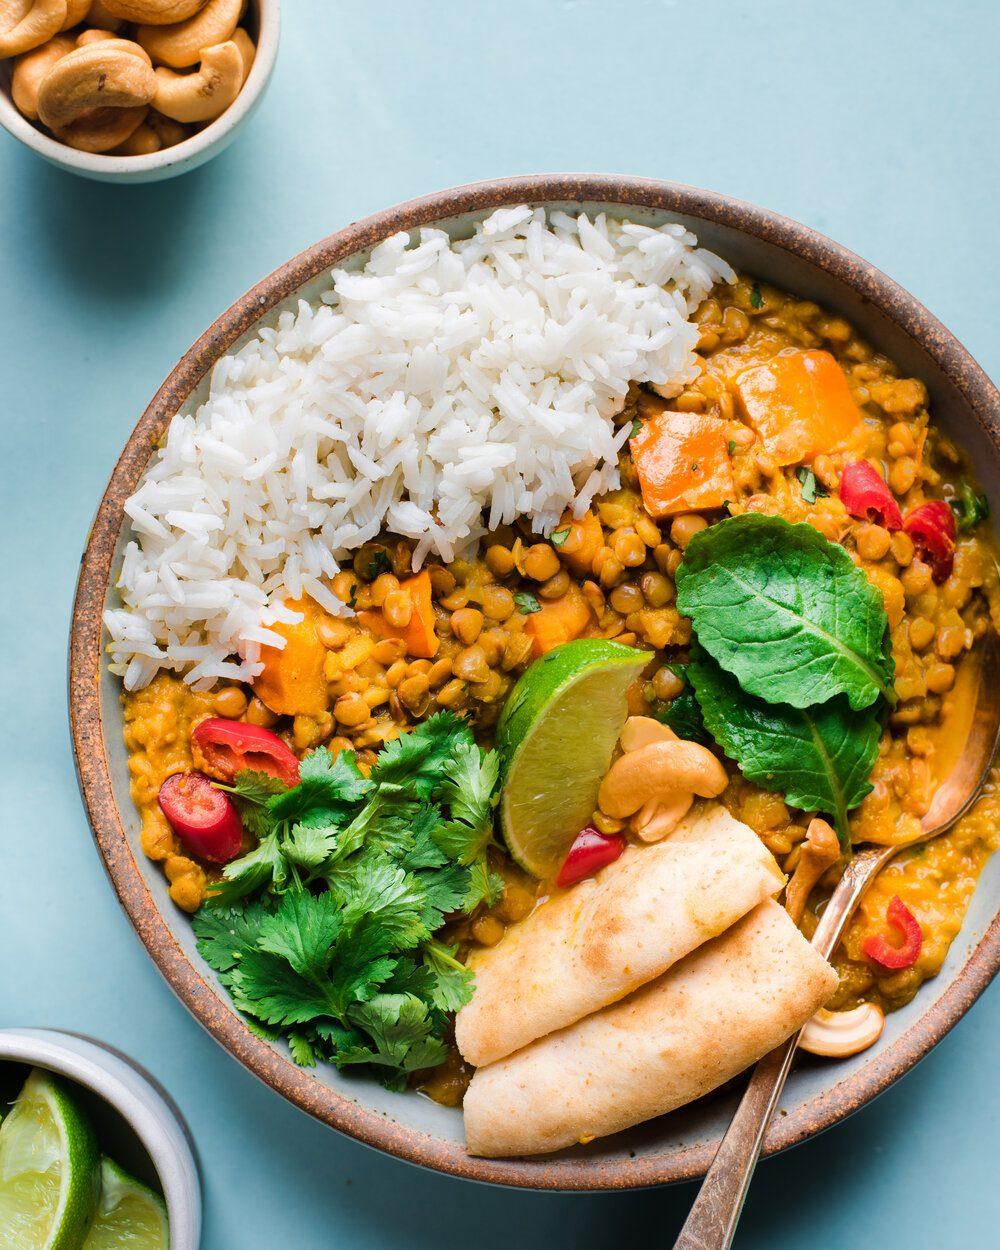 Healthy Vegan Instant Pot Recipes to Make This Winter. Vegan Instant Pot Butternut Squash Lentil Curry.